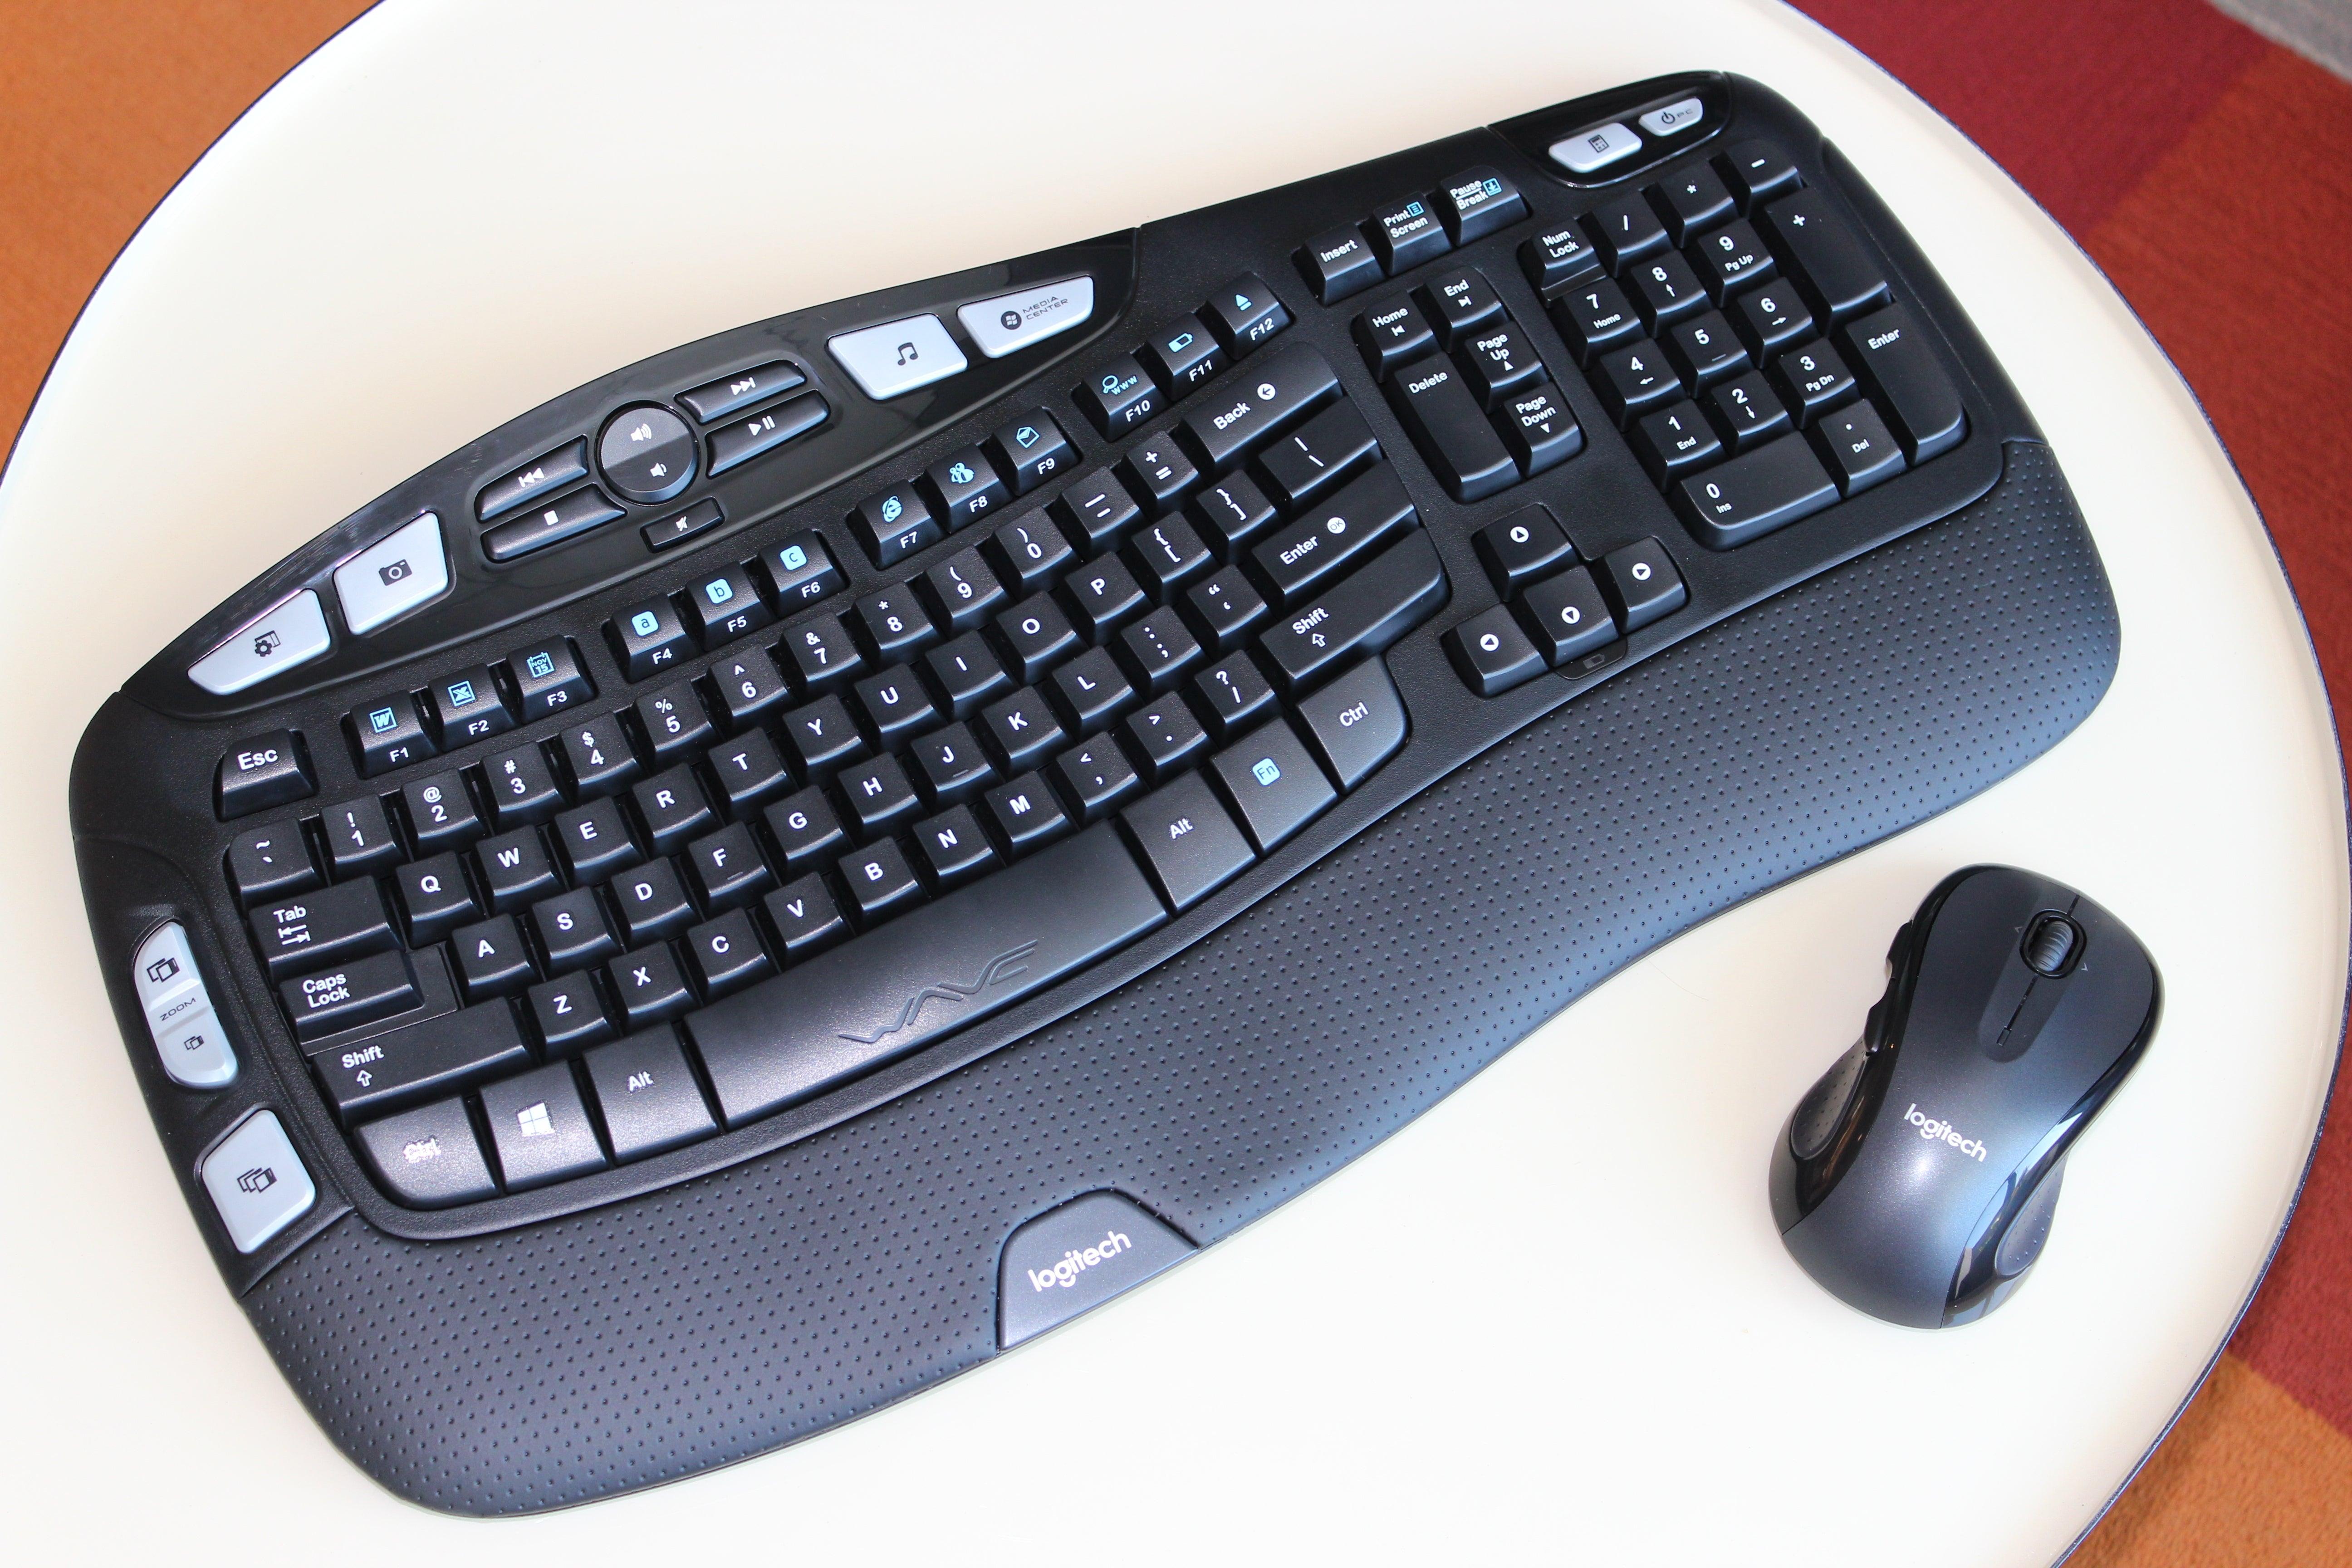 6740119cabb Logitech Wireless Wave Combo MK550 review: This ergonomic keyboard needs  better keys